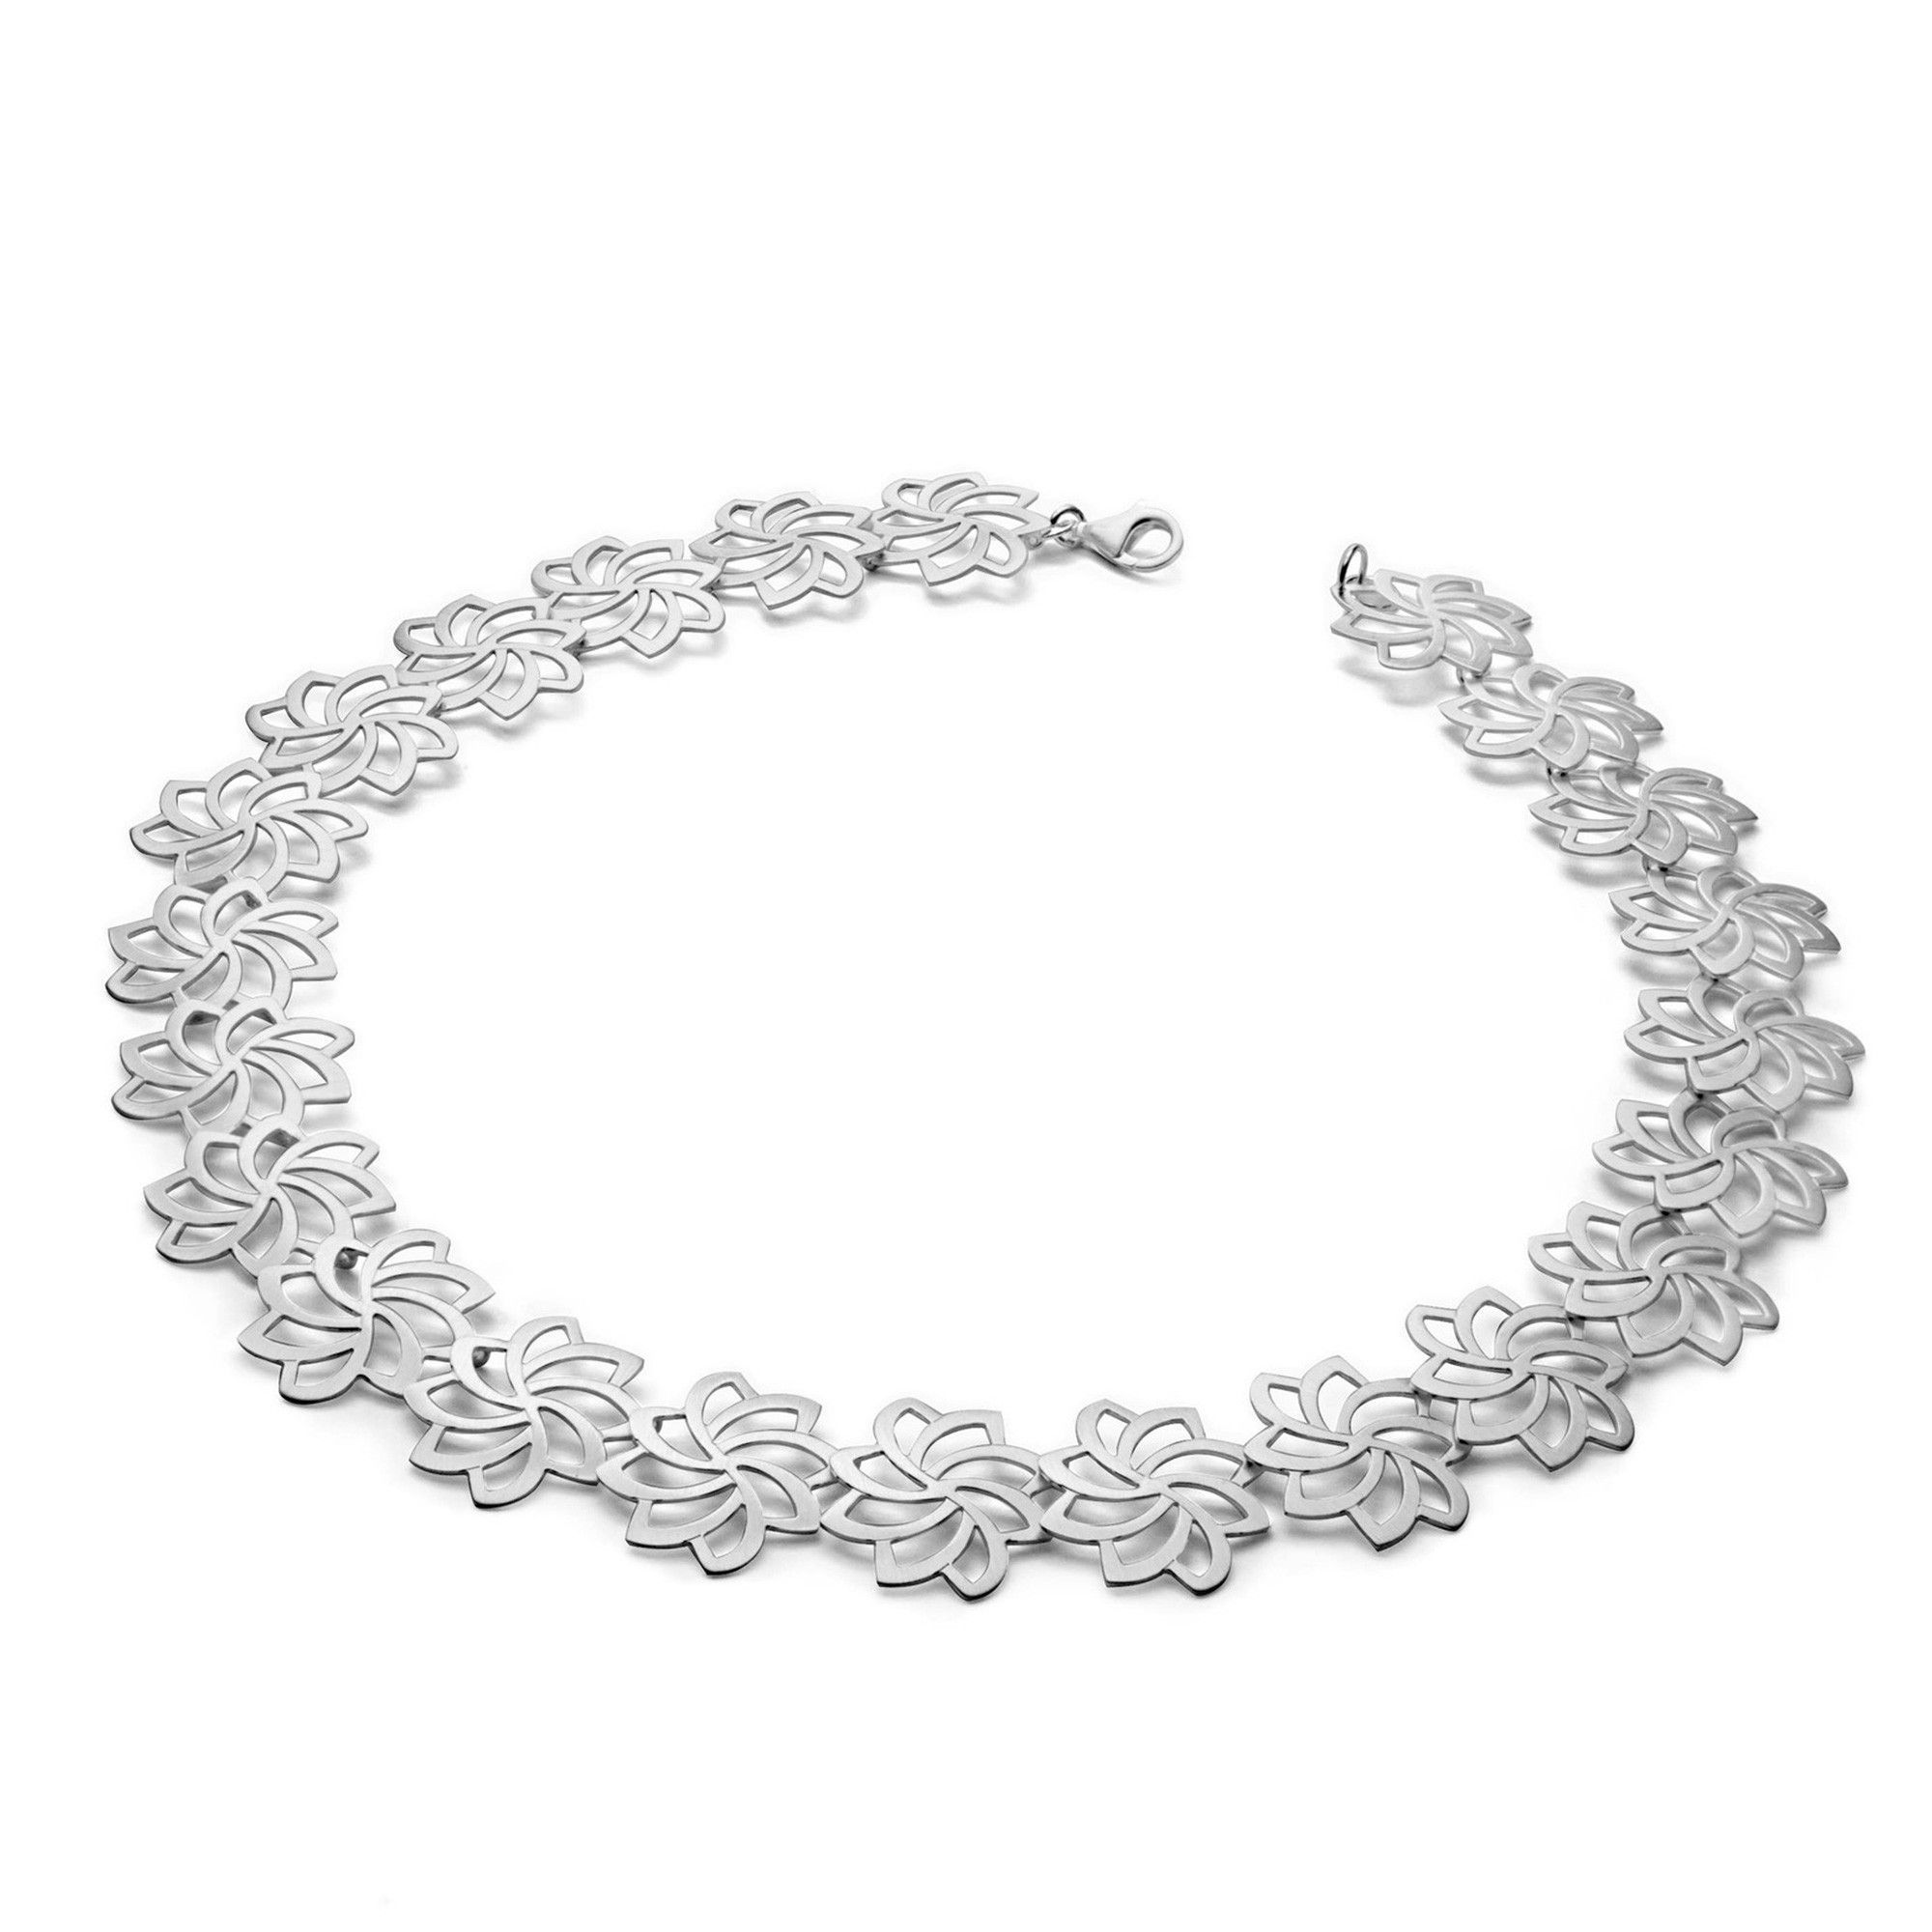 Kelim jewelry design lotus flower necklace lotus flower lotus kelim jewelry design lotus flower necklace izmirmasajfo Images